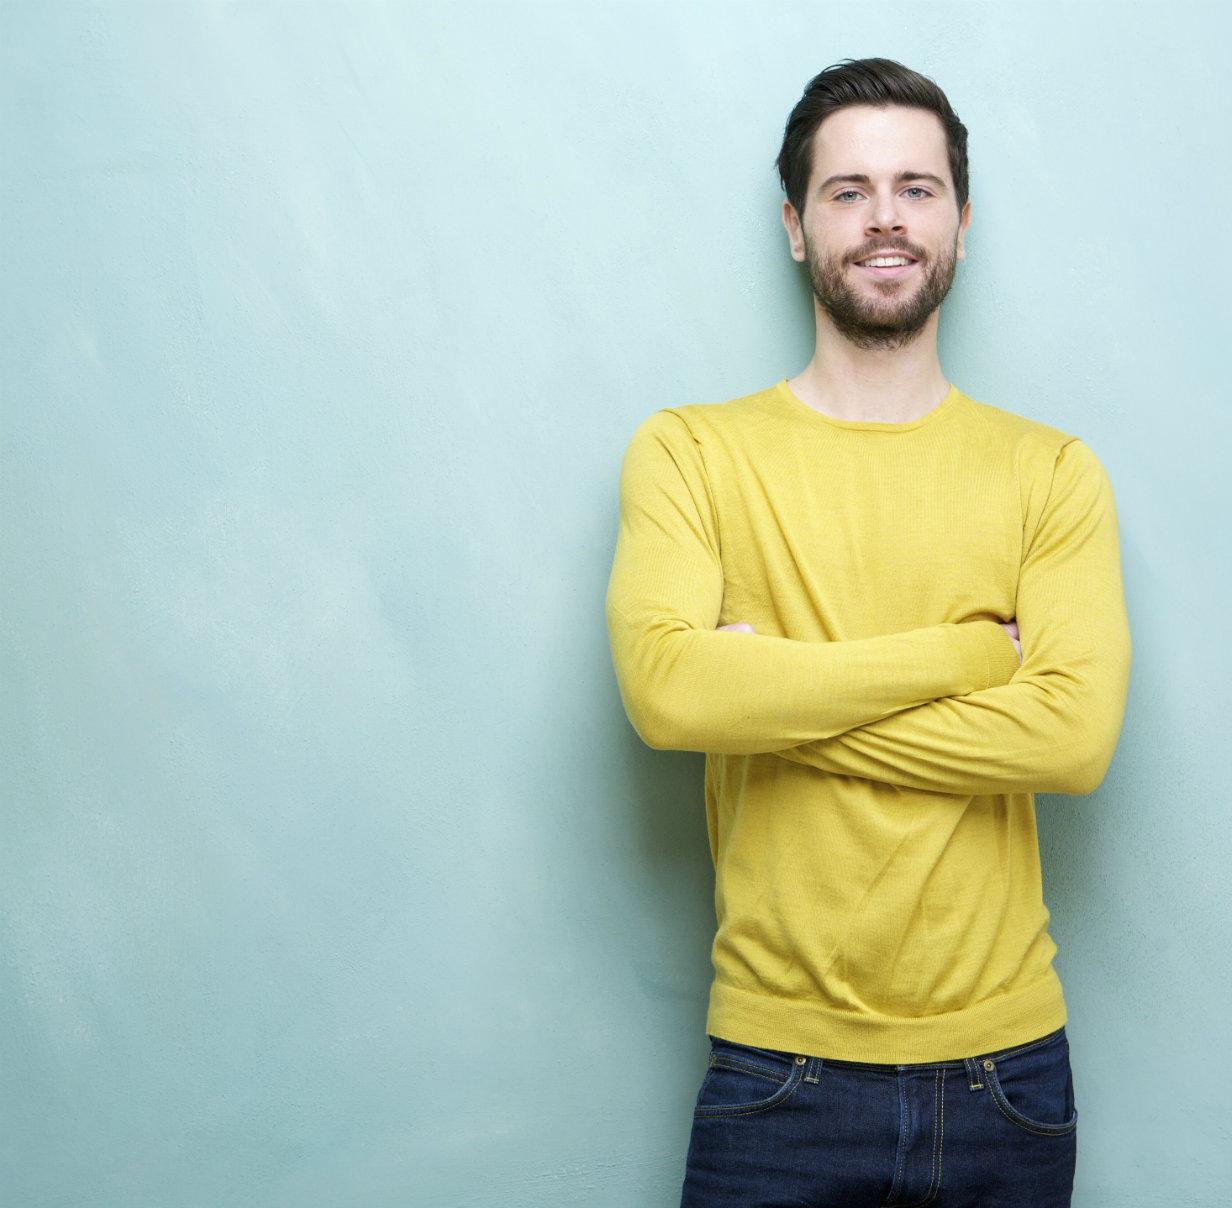 993126ca0 Comment porter du jaune ? | Masculin.com